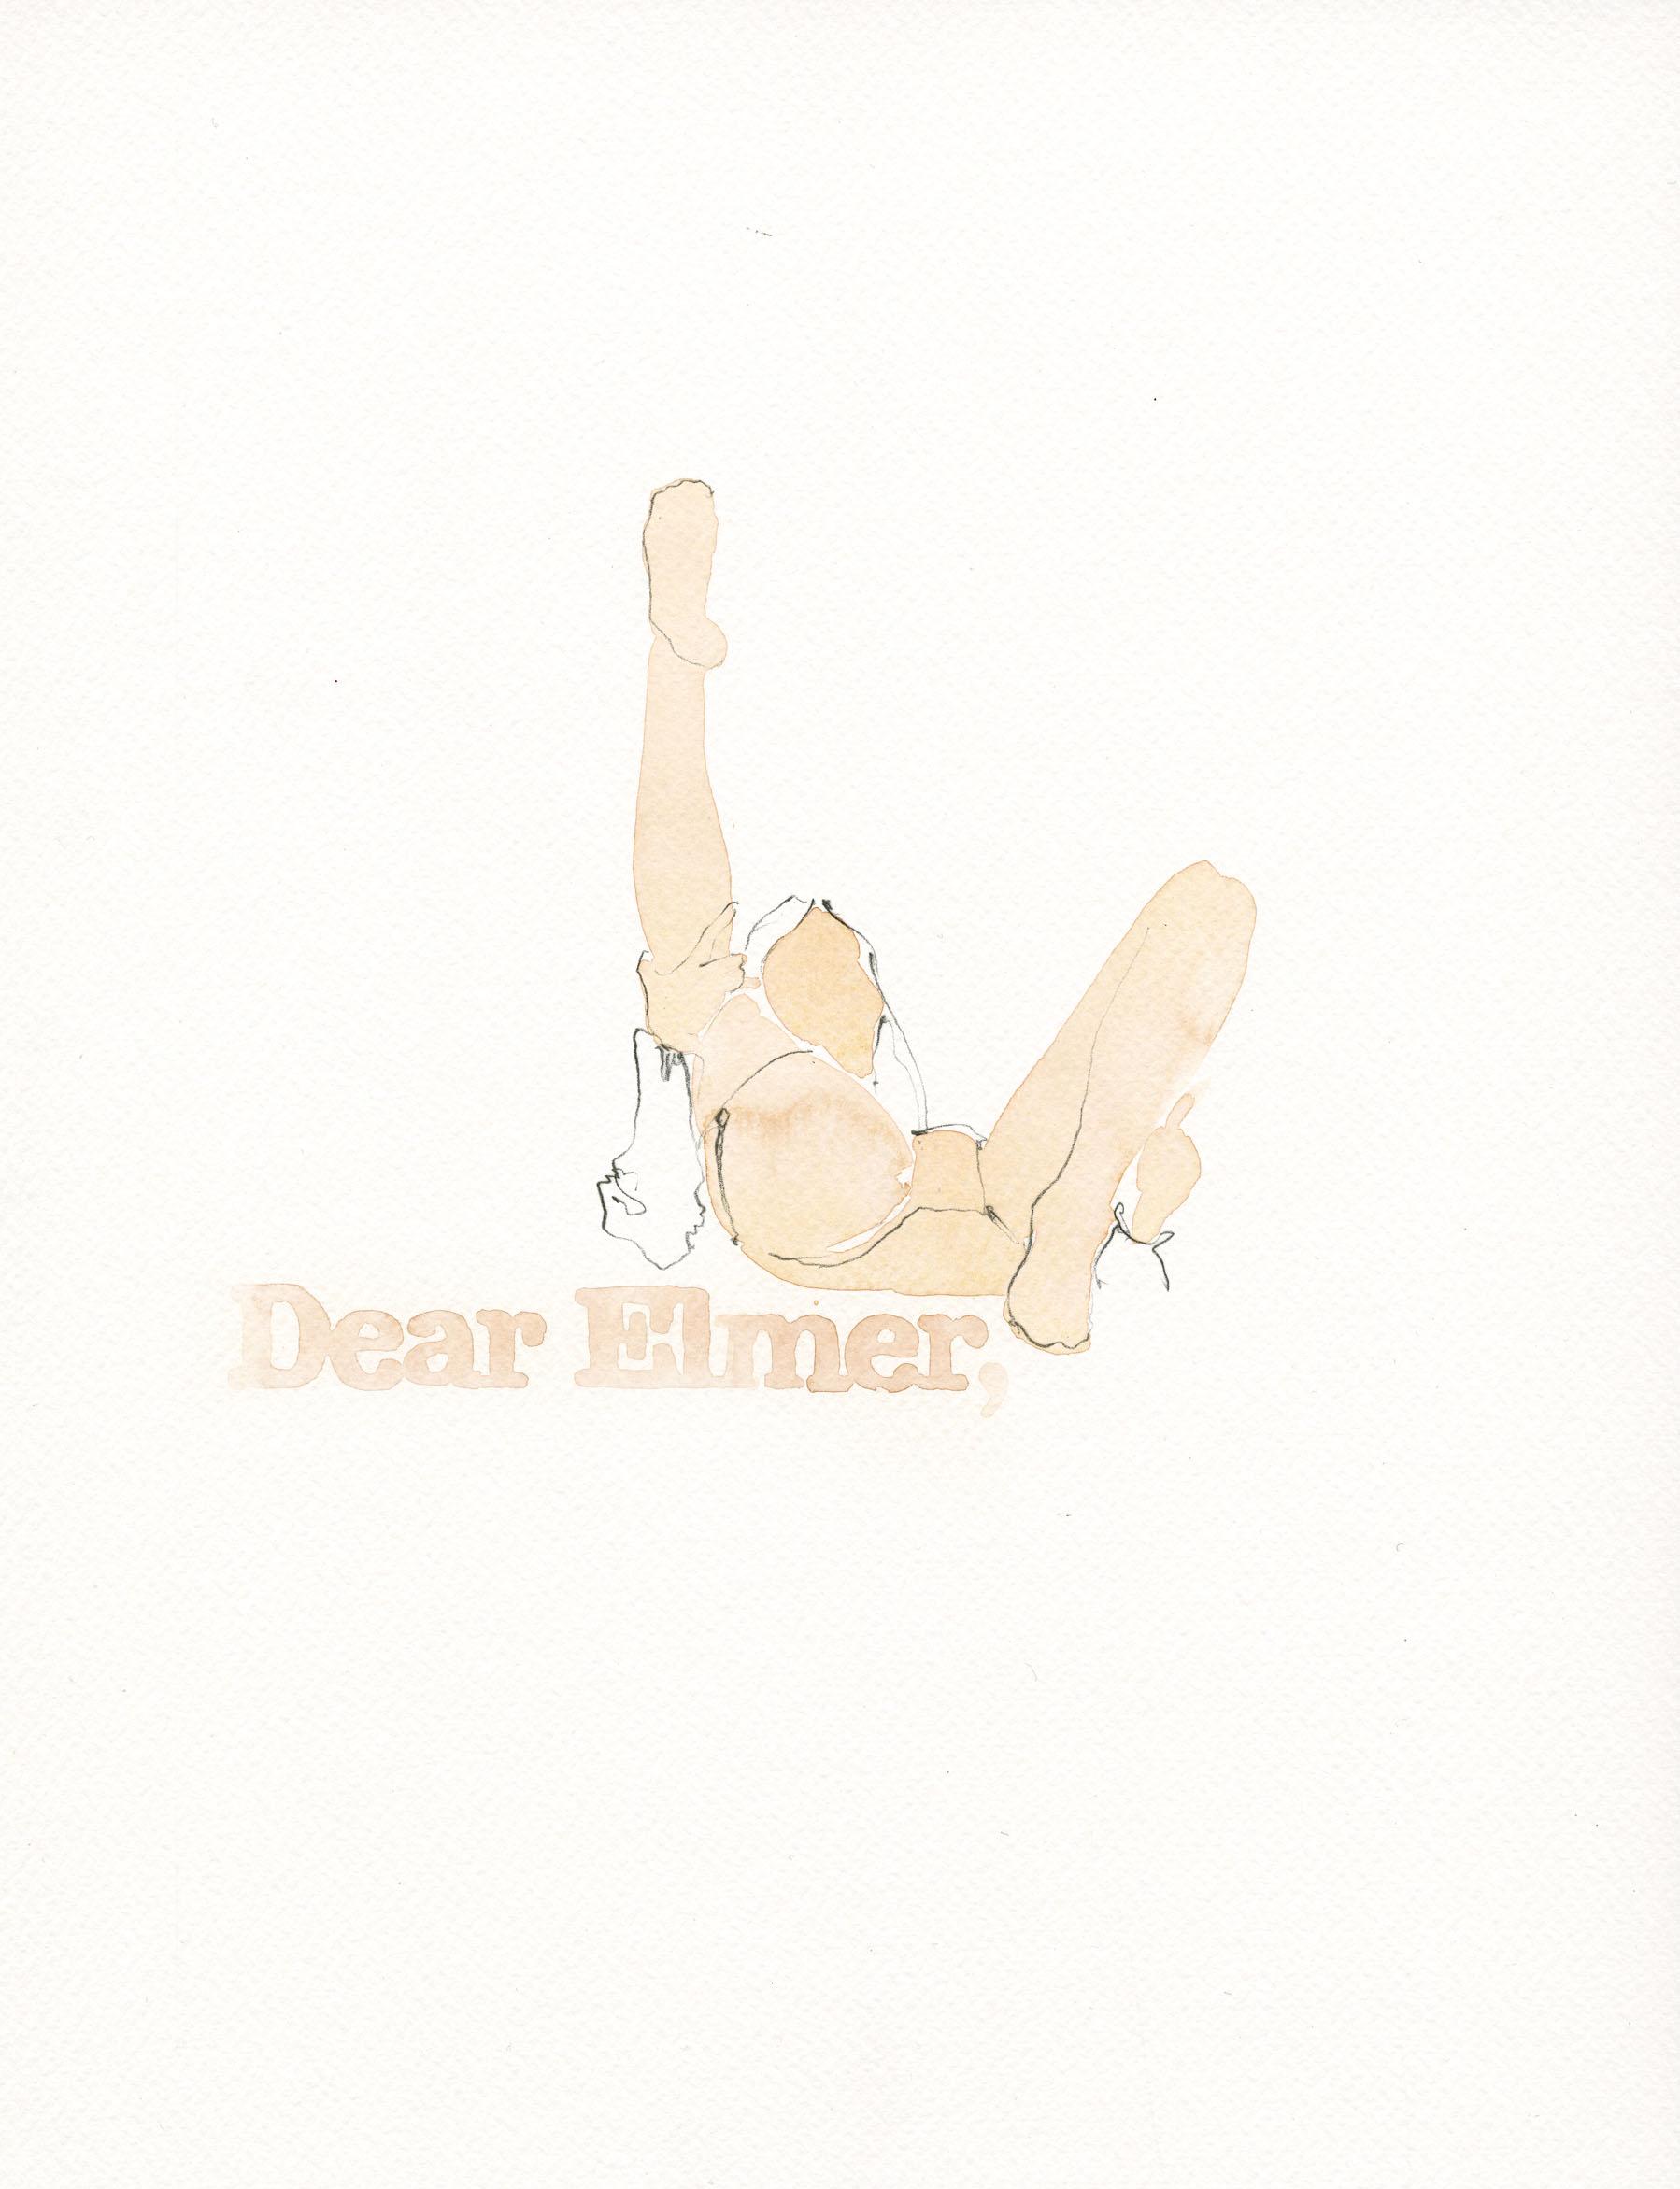 Dear Elmer